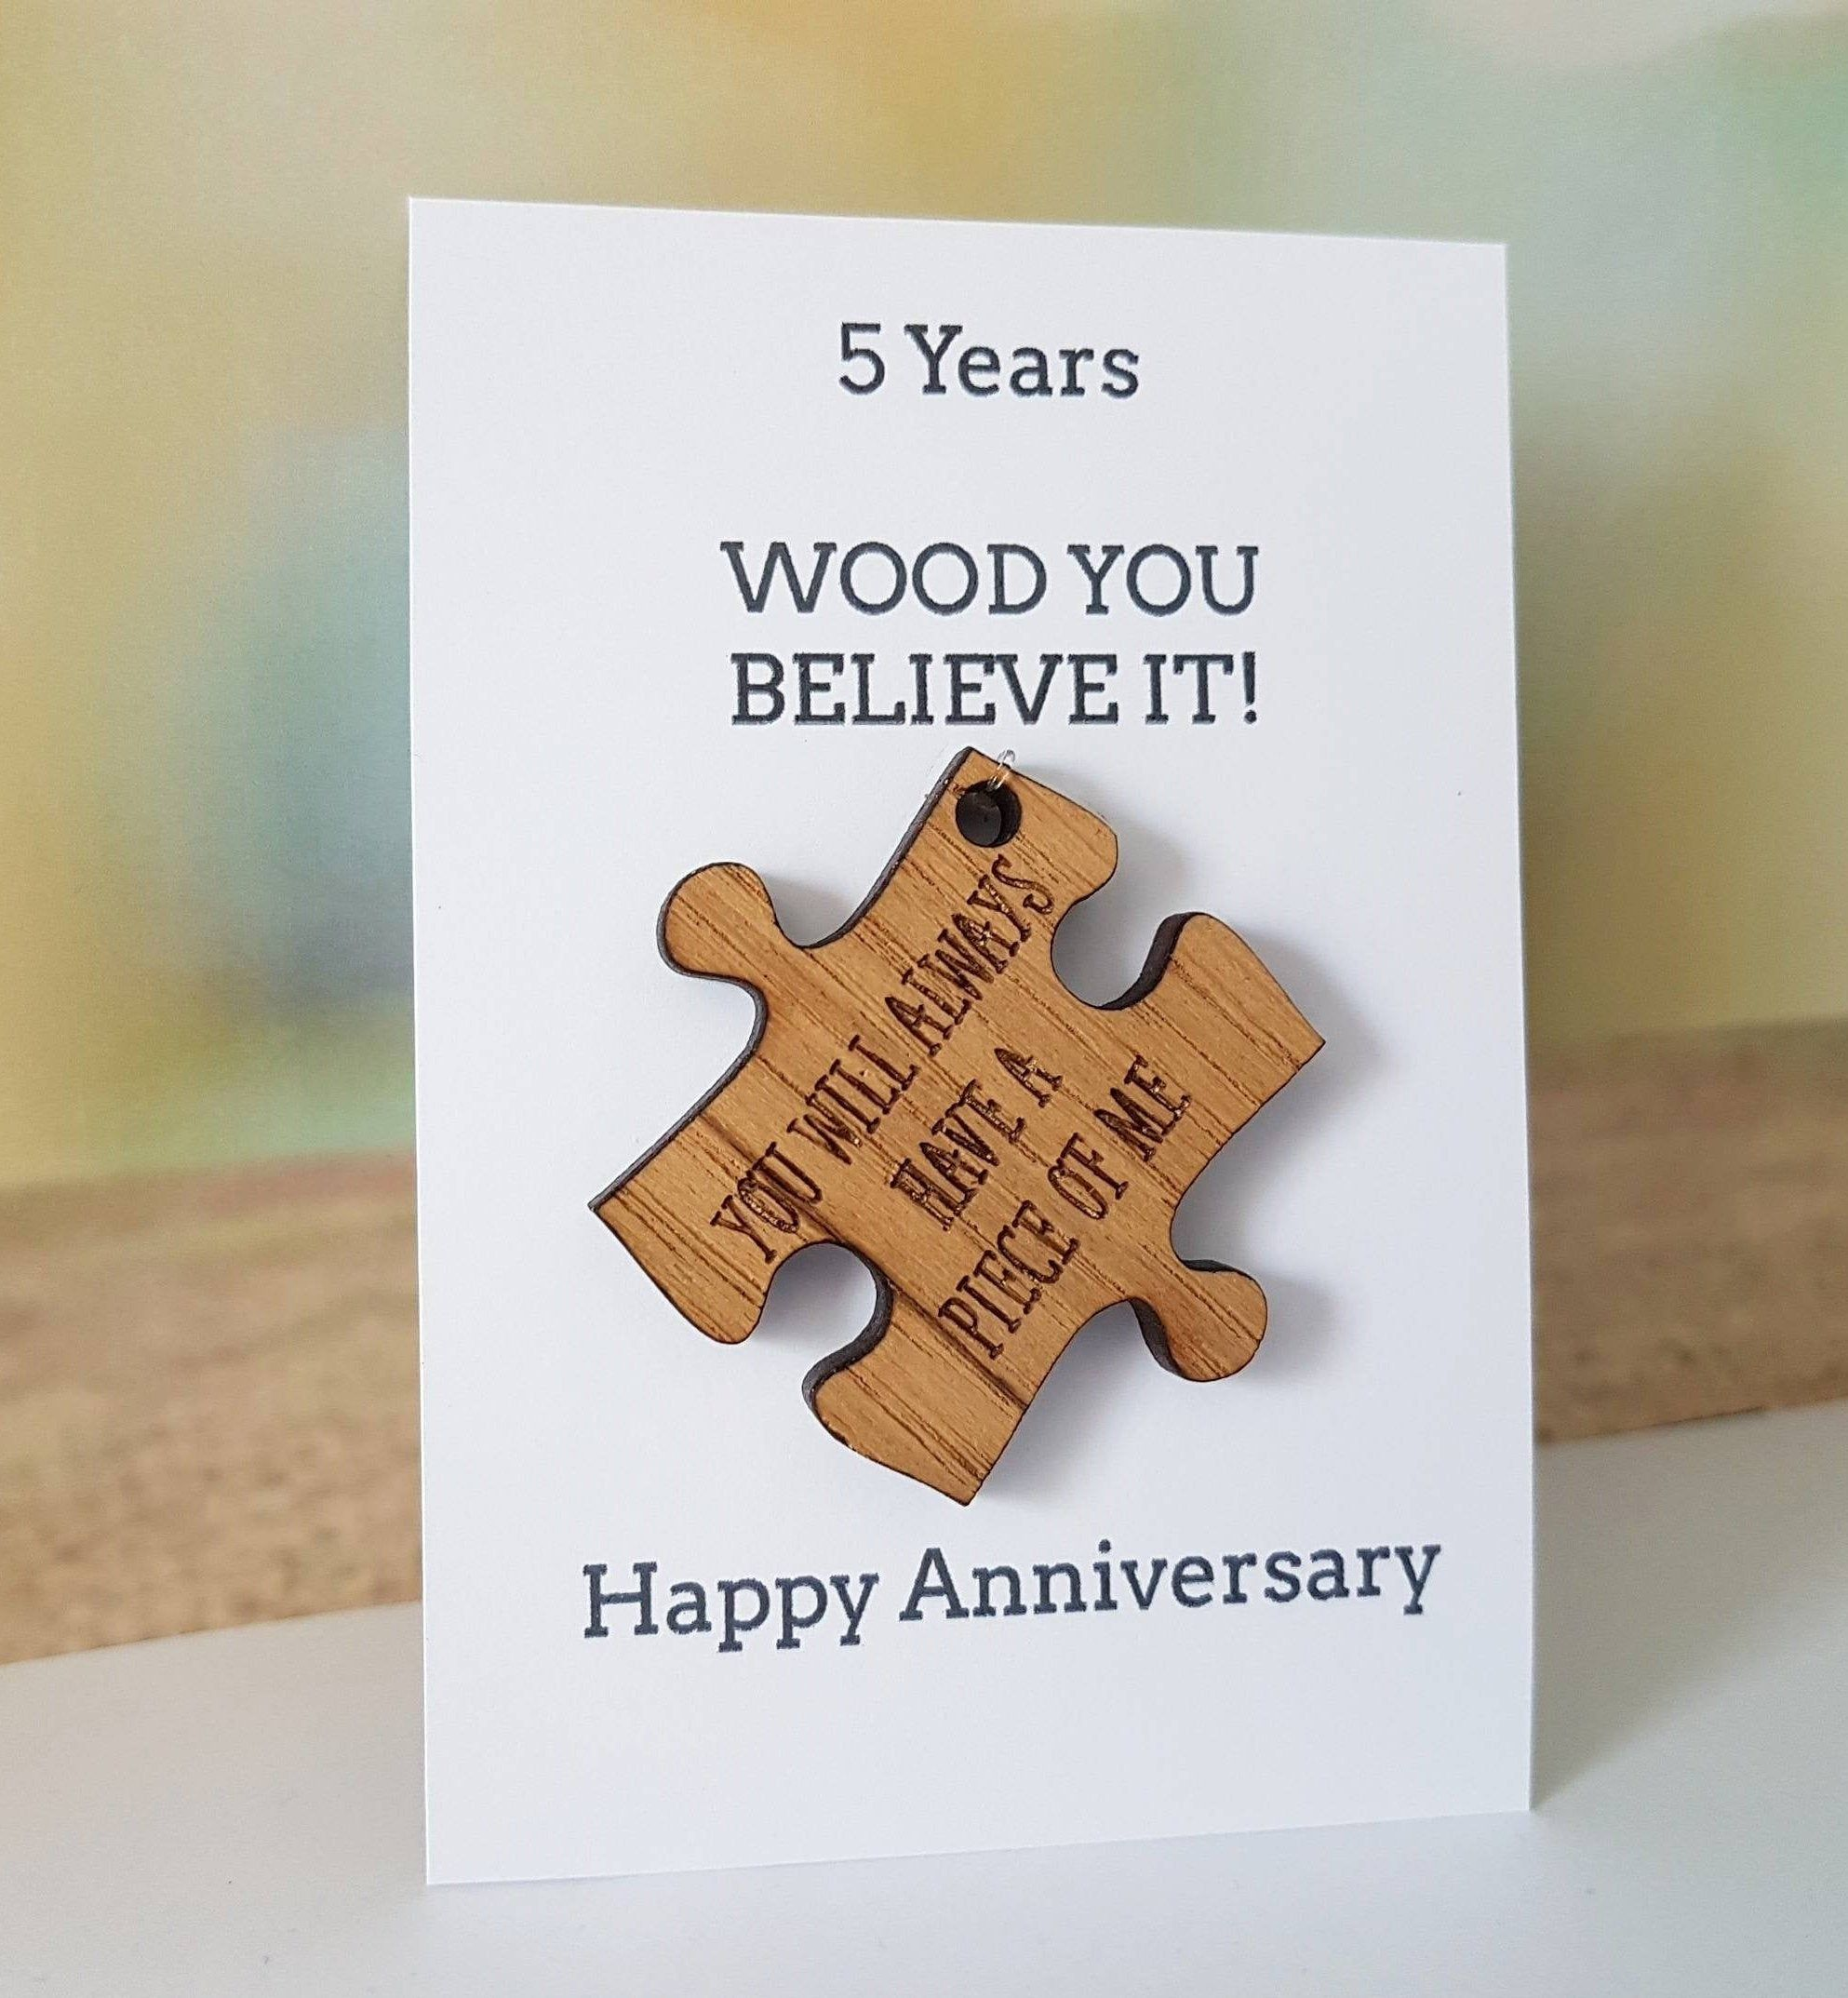 5th Anniversary Card Husbandgift Wife Card Wood Wooden Gift Wedding Anniversary G Wooden Anniversary Gift Wood Anniversary Gift Wedding Anniversary Cards